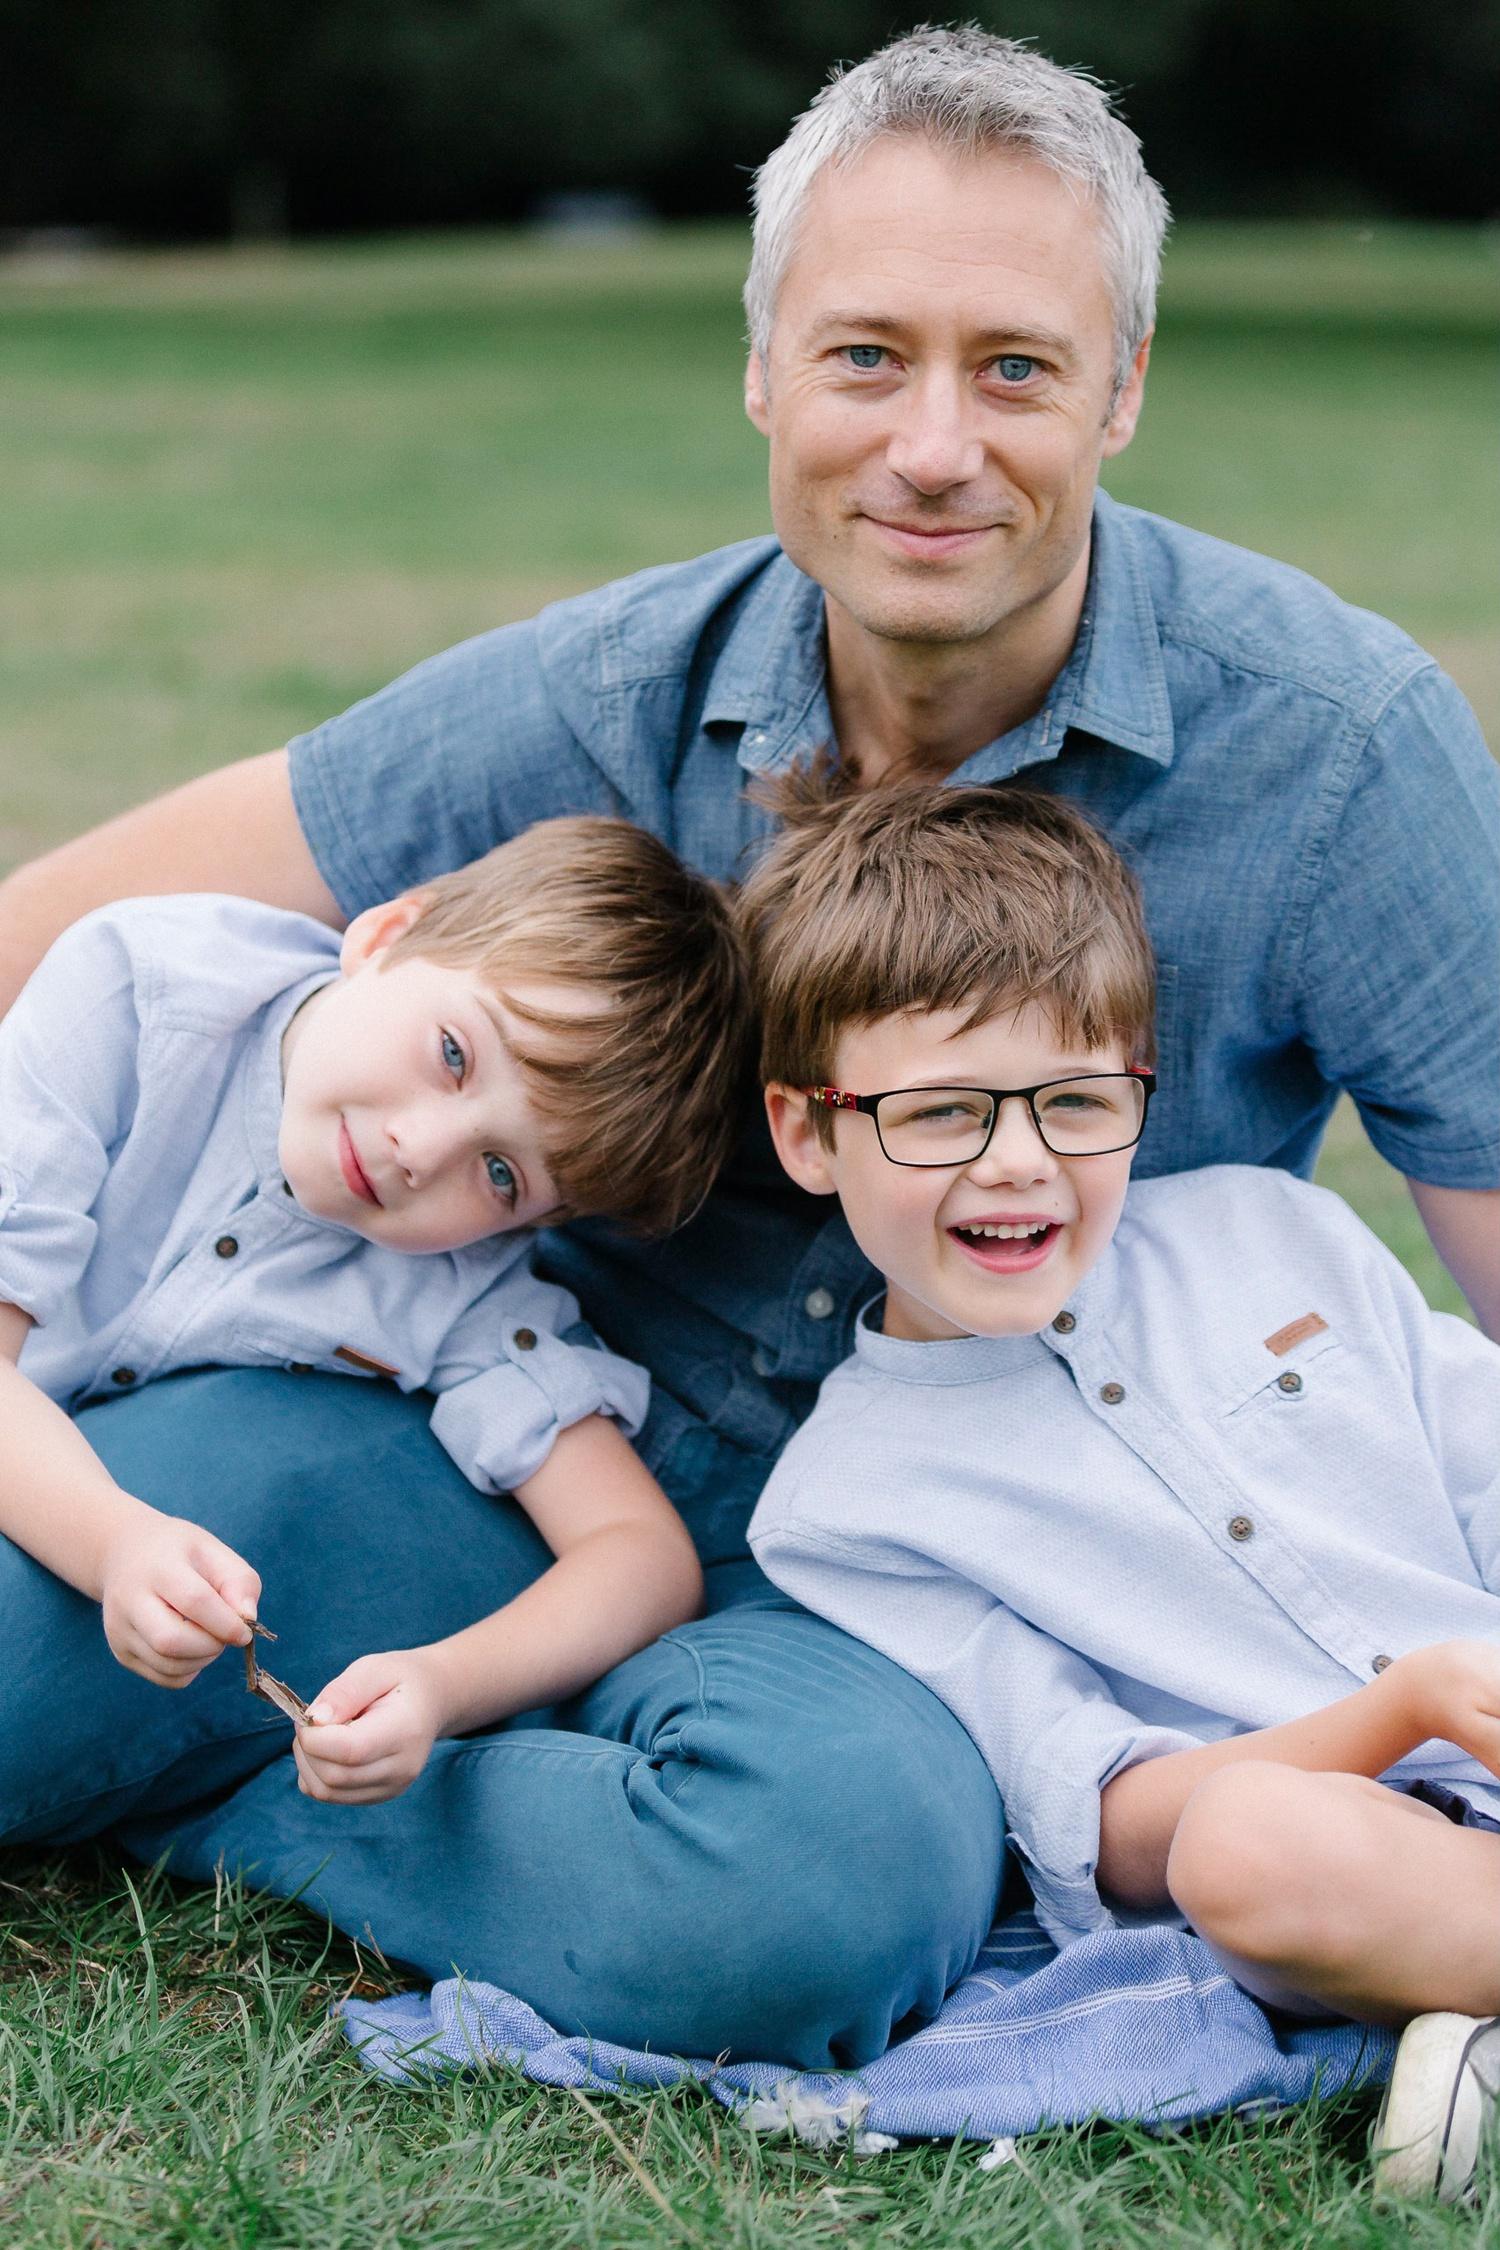 hampshire-family-photographer-25.jpg